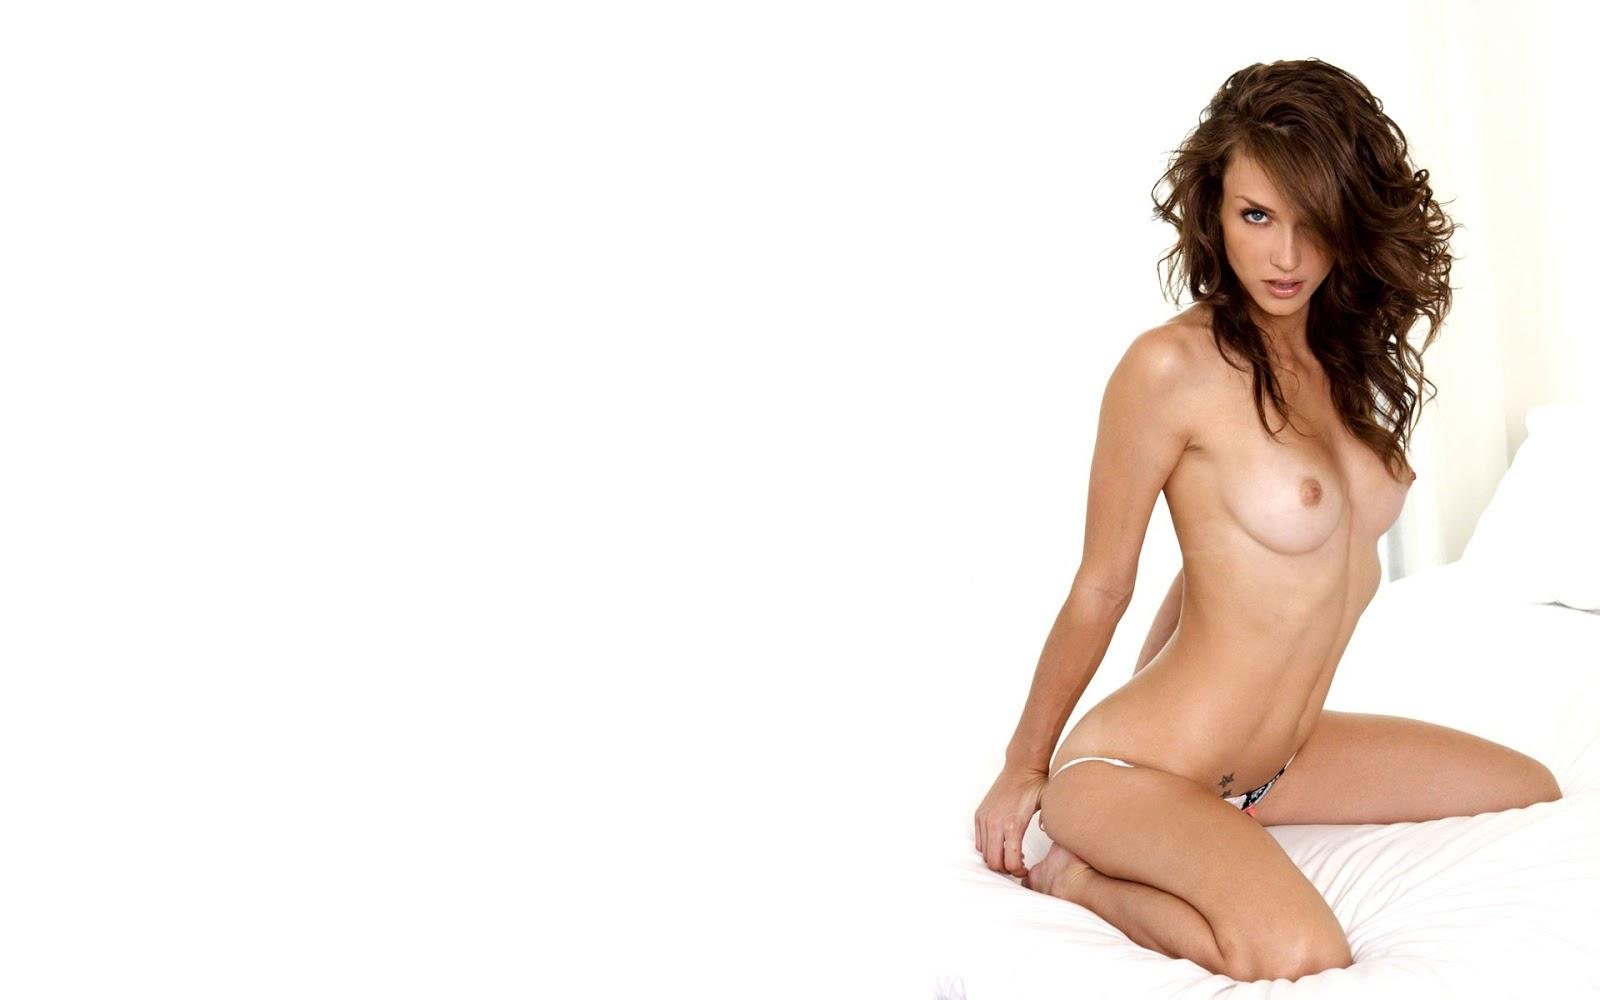 Erotic Wallpapers Images Of Ashley Bulgari